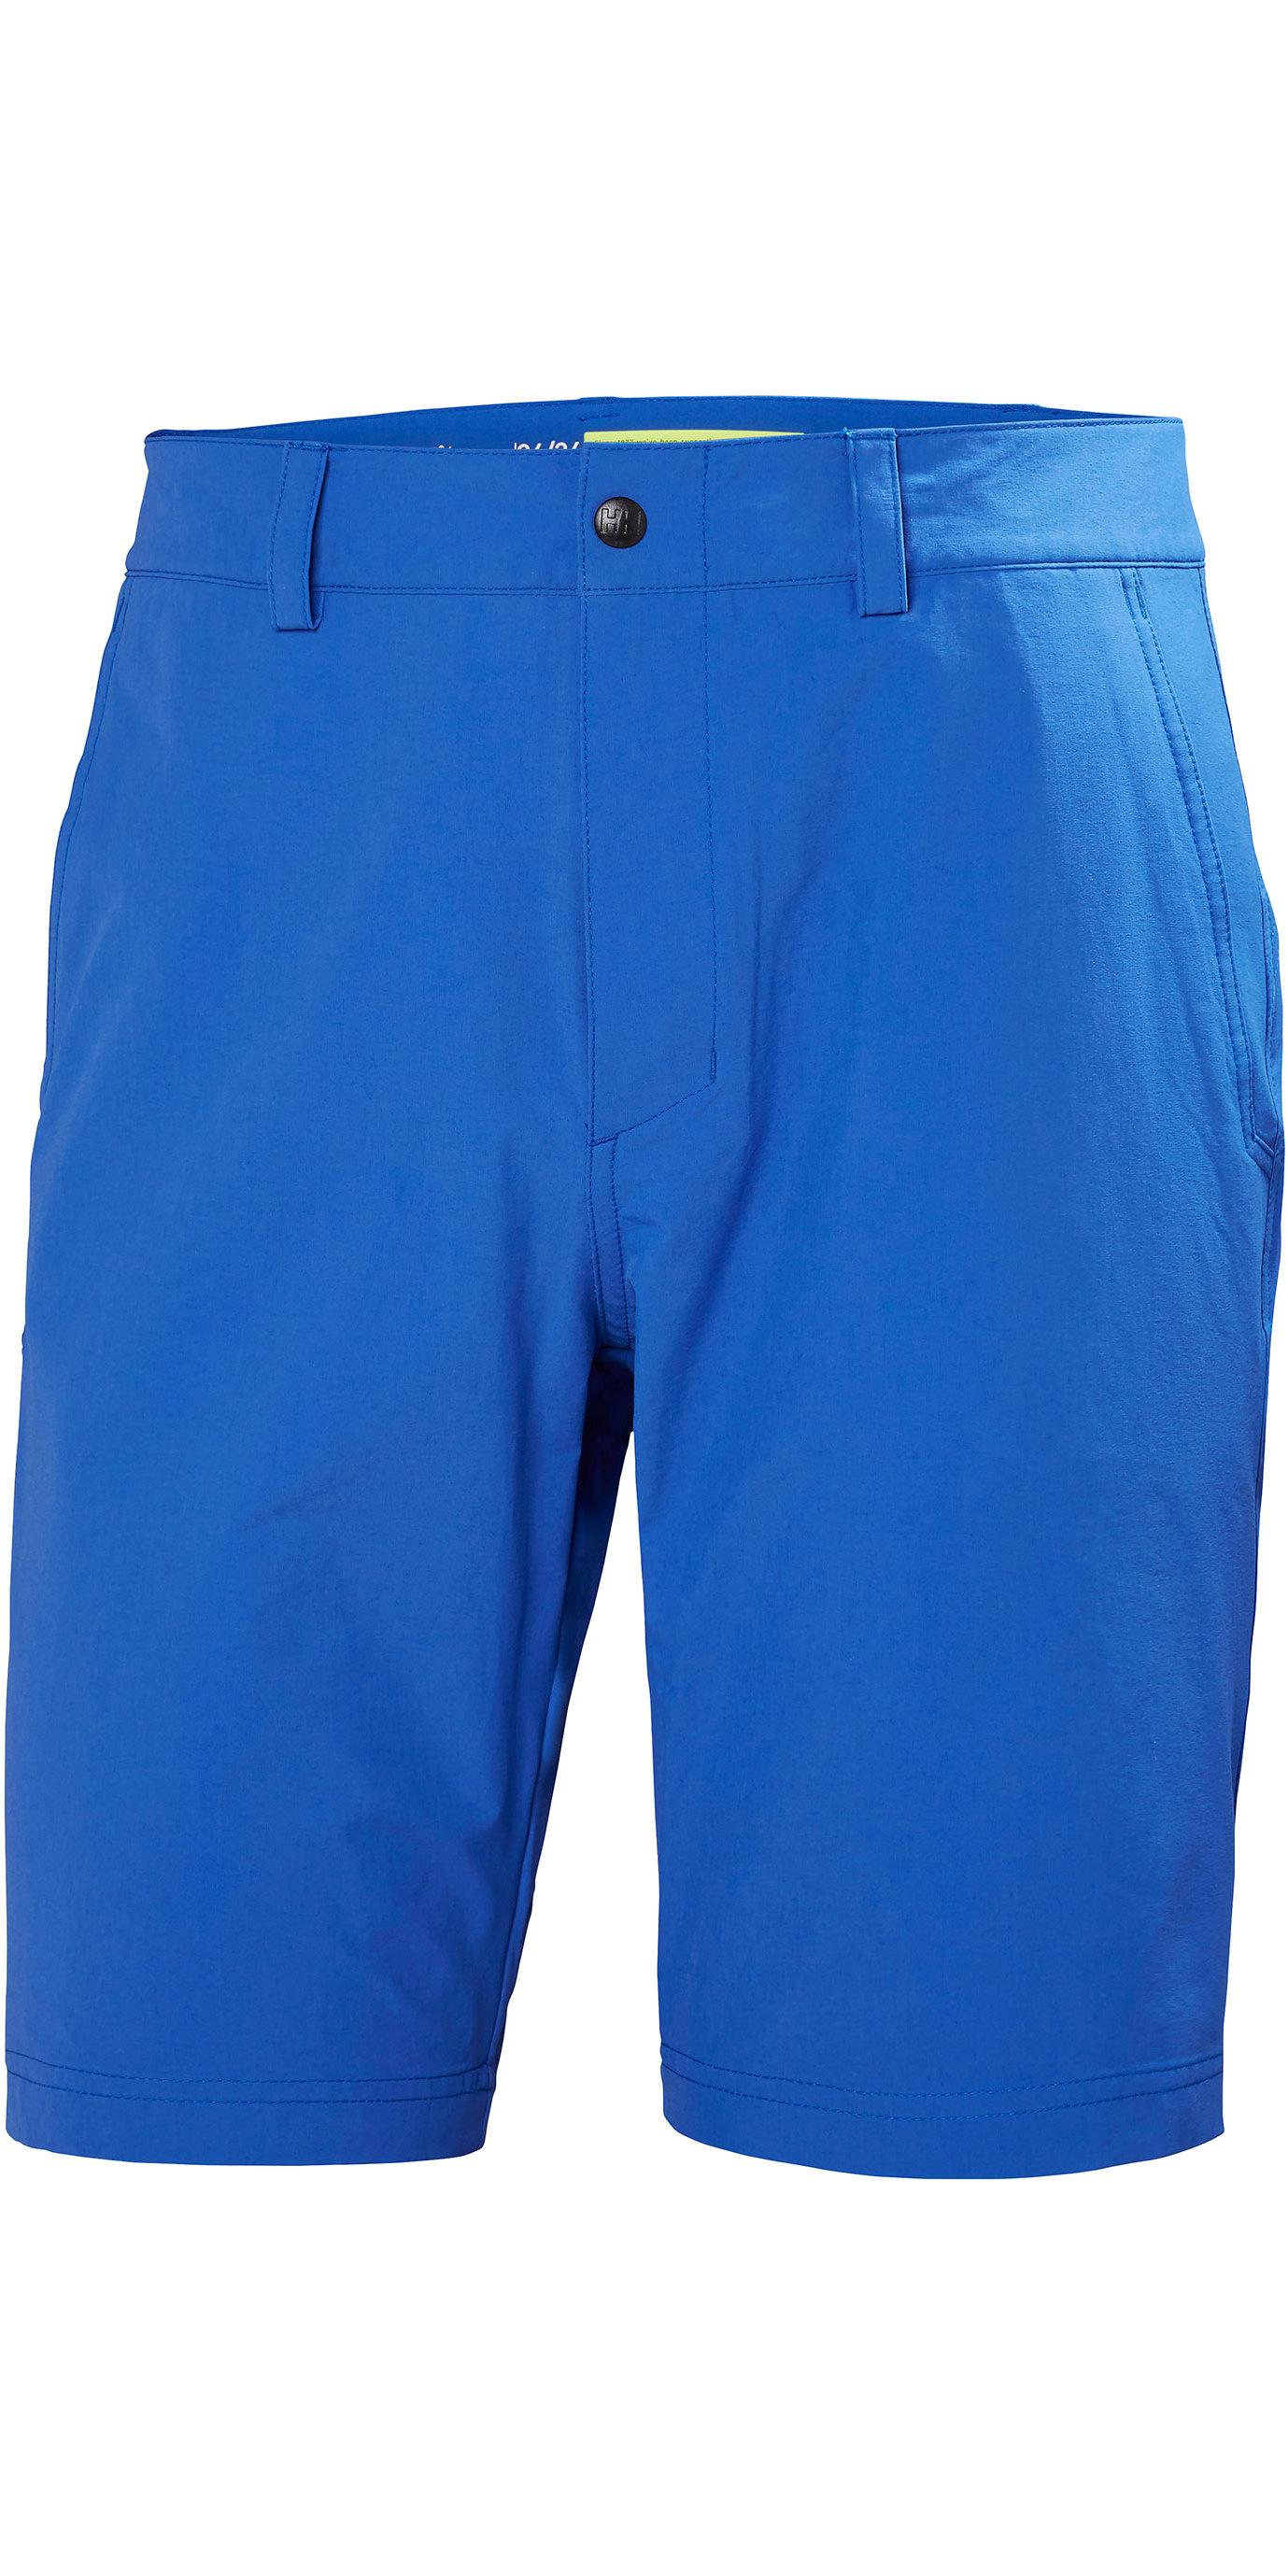 712788bfb1 2019 Helly Hansen Mens Qd 10 Club Shorts Olympian Blue 33933 ...